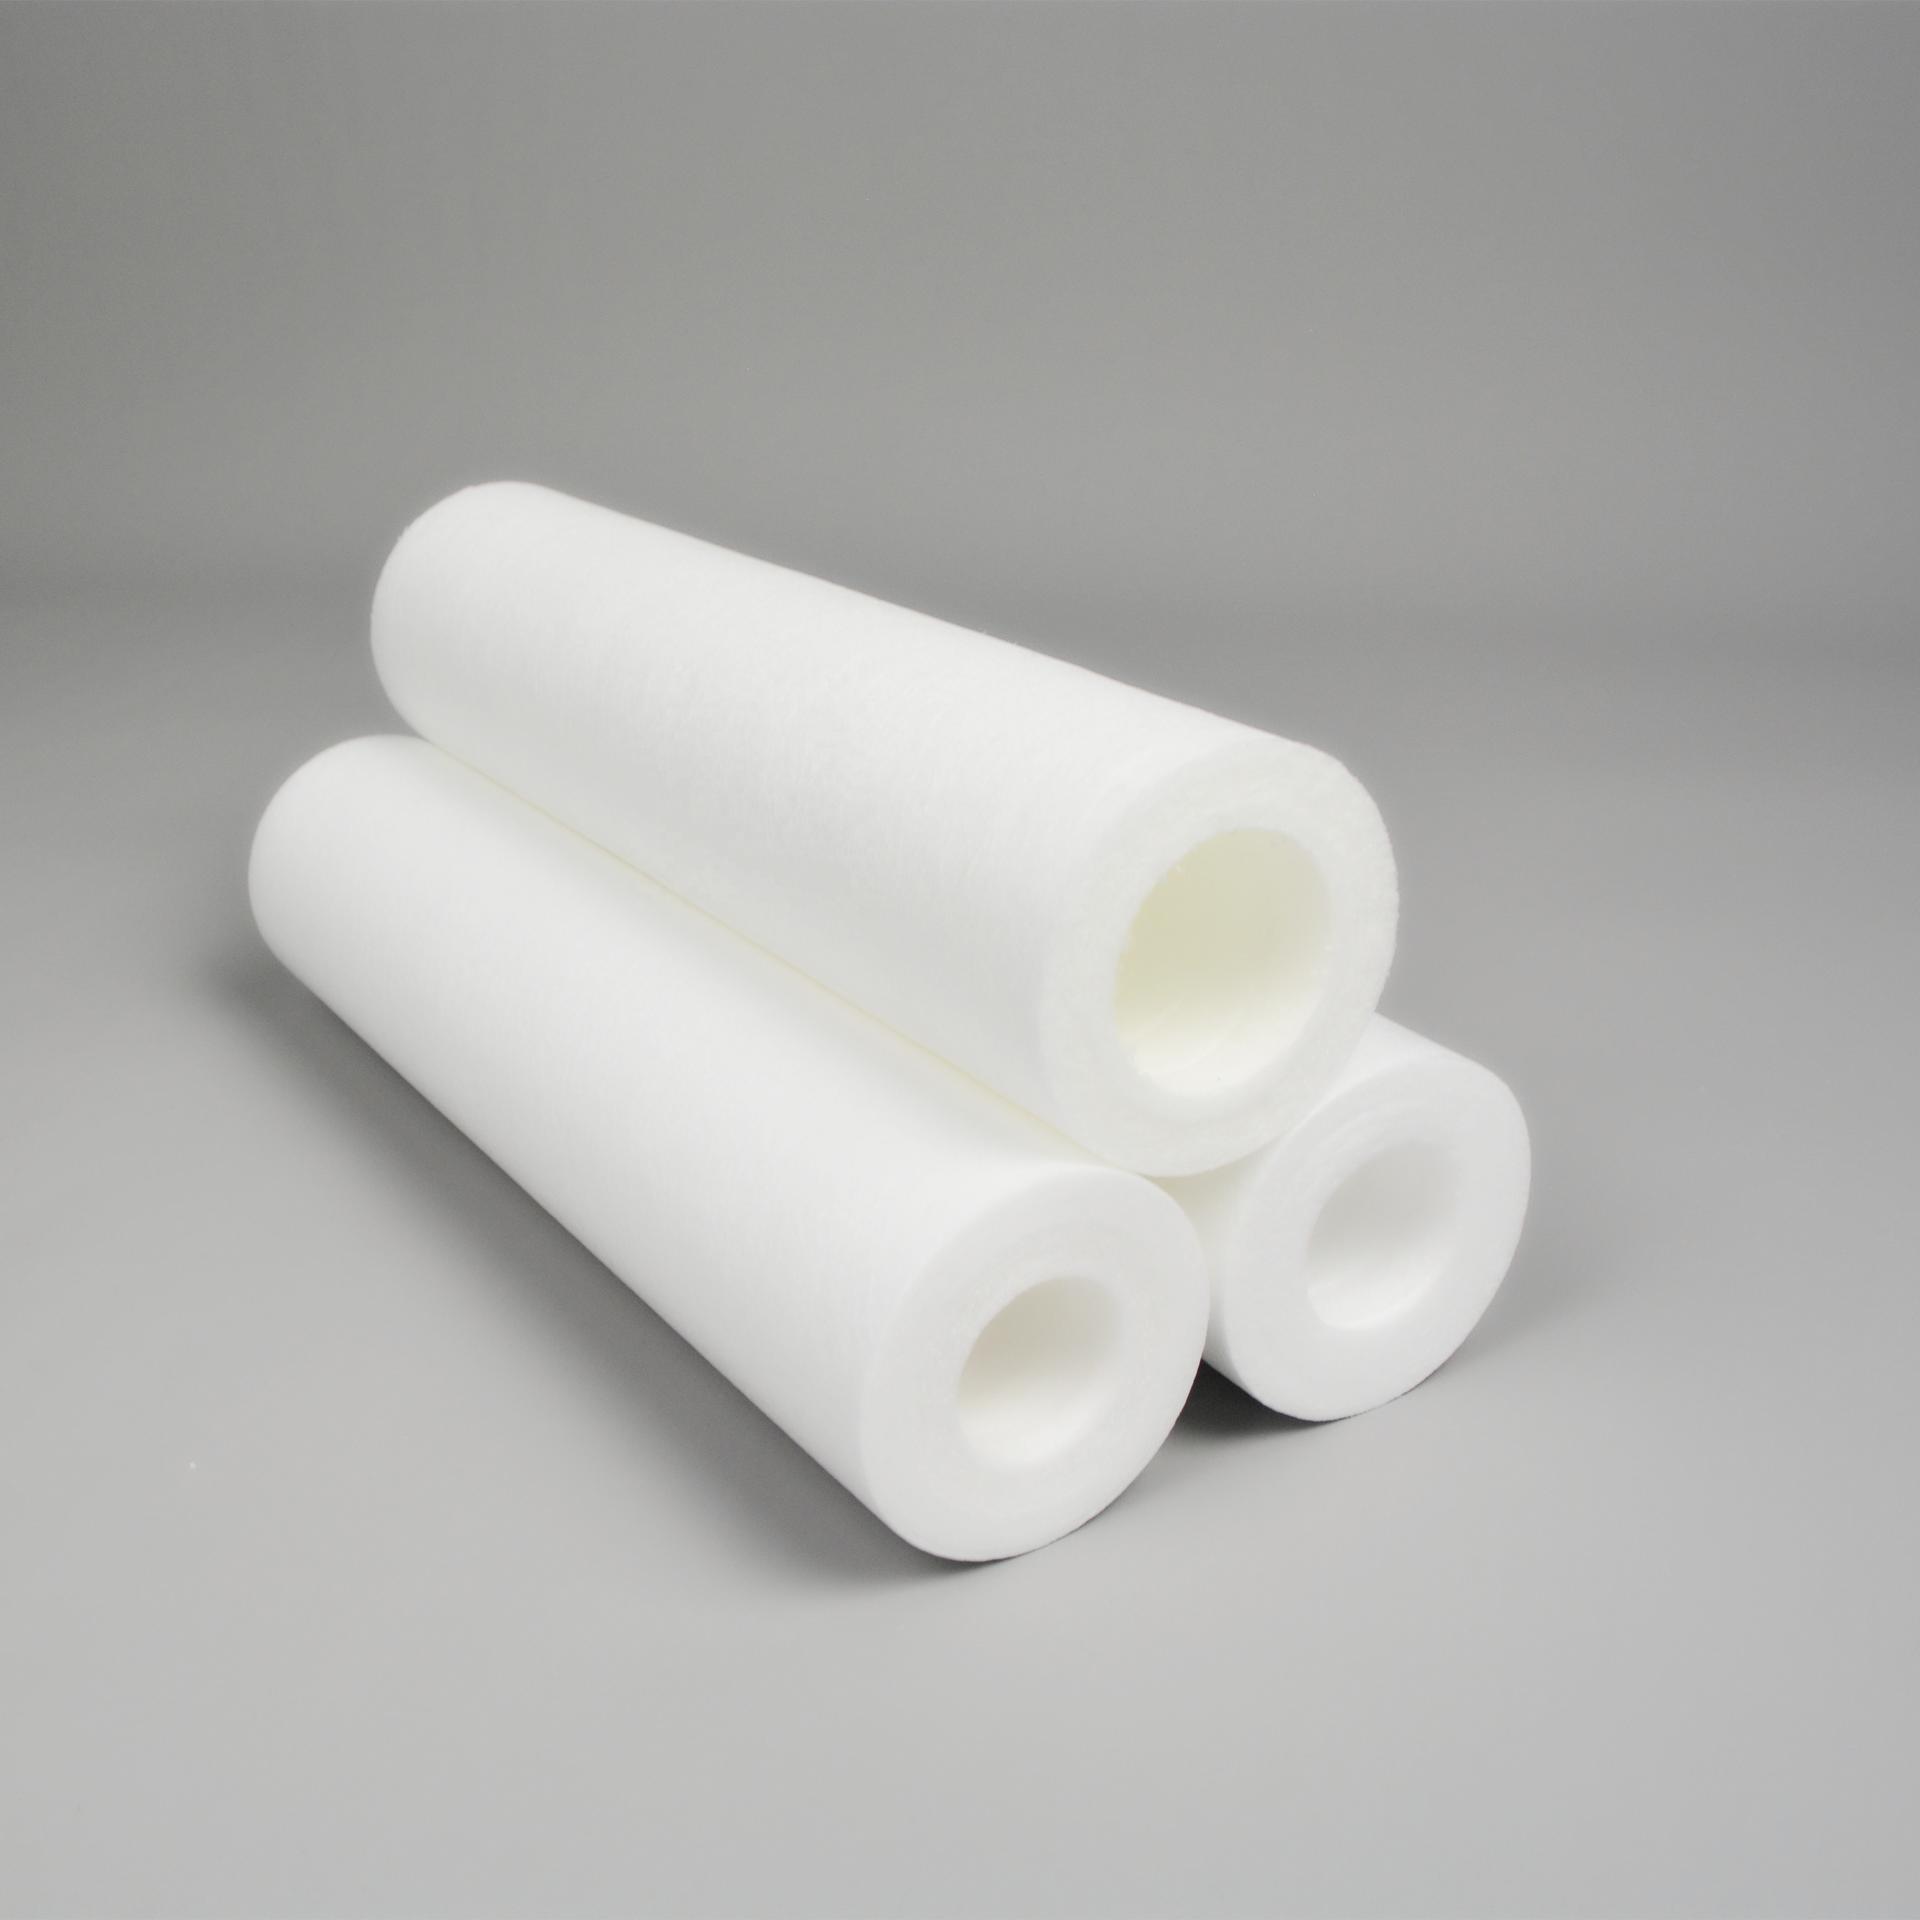 10 20 30 40 inch water purifier replacement pp sediment filter /DOE pp water filter melt blown filter cartridge